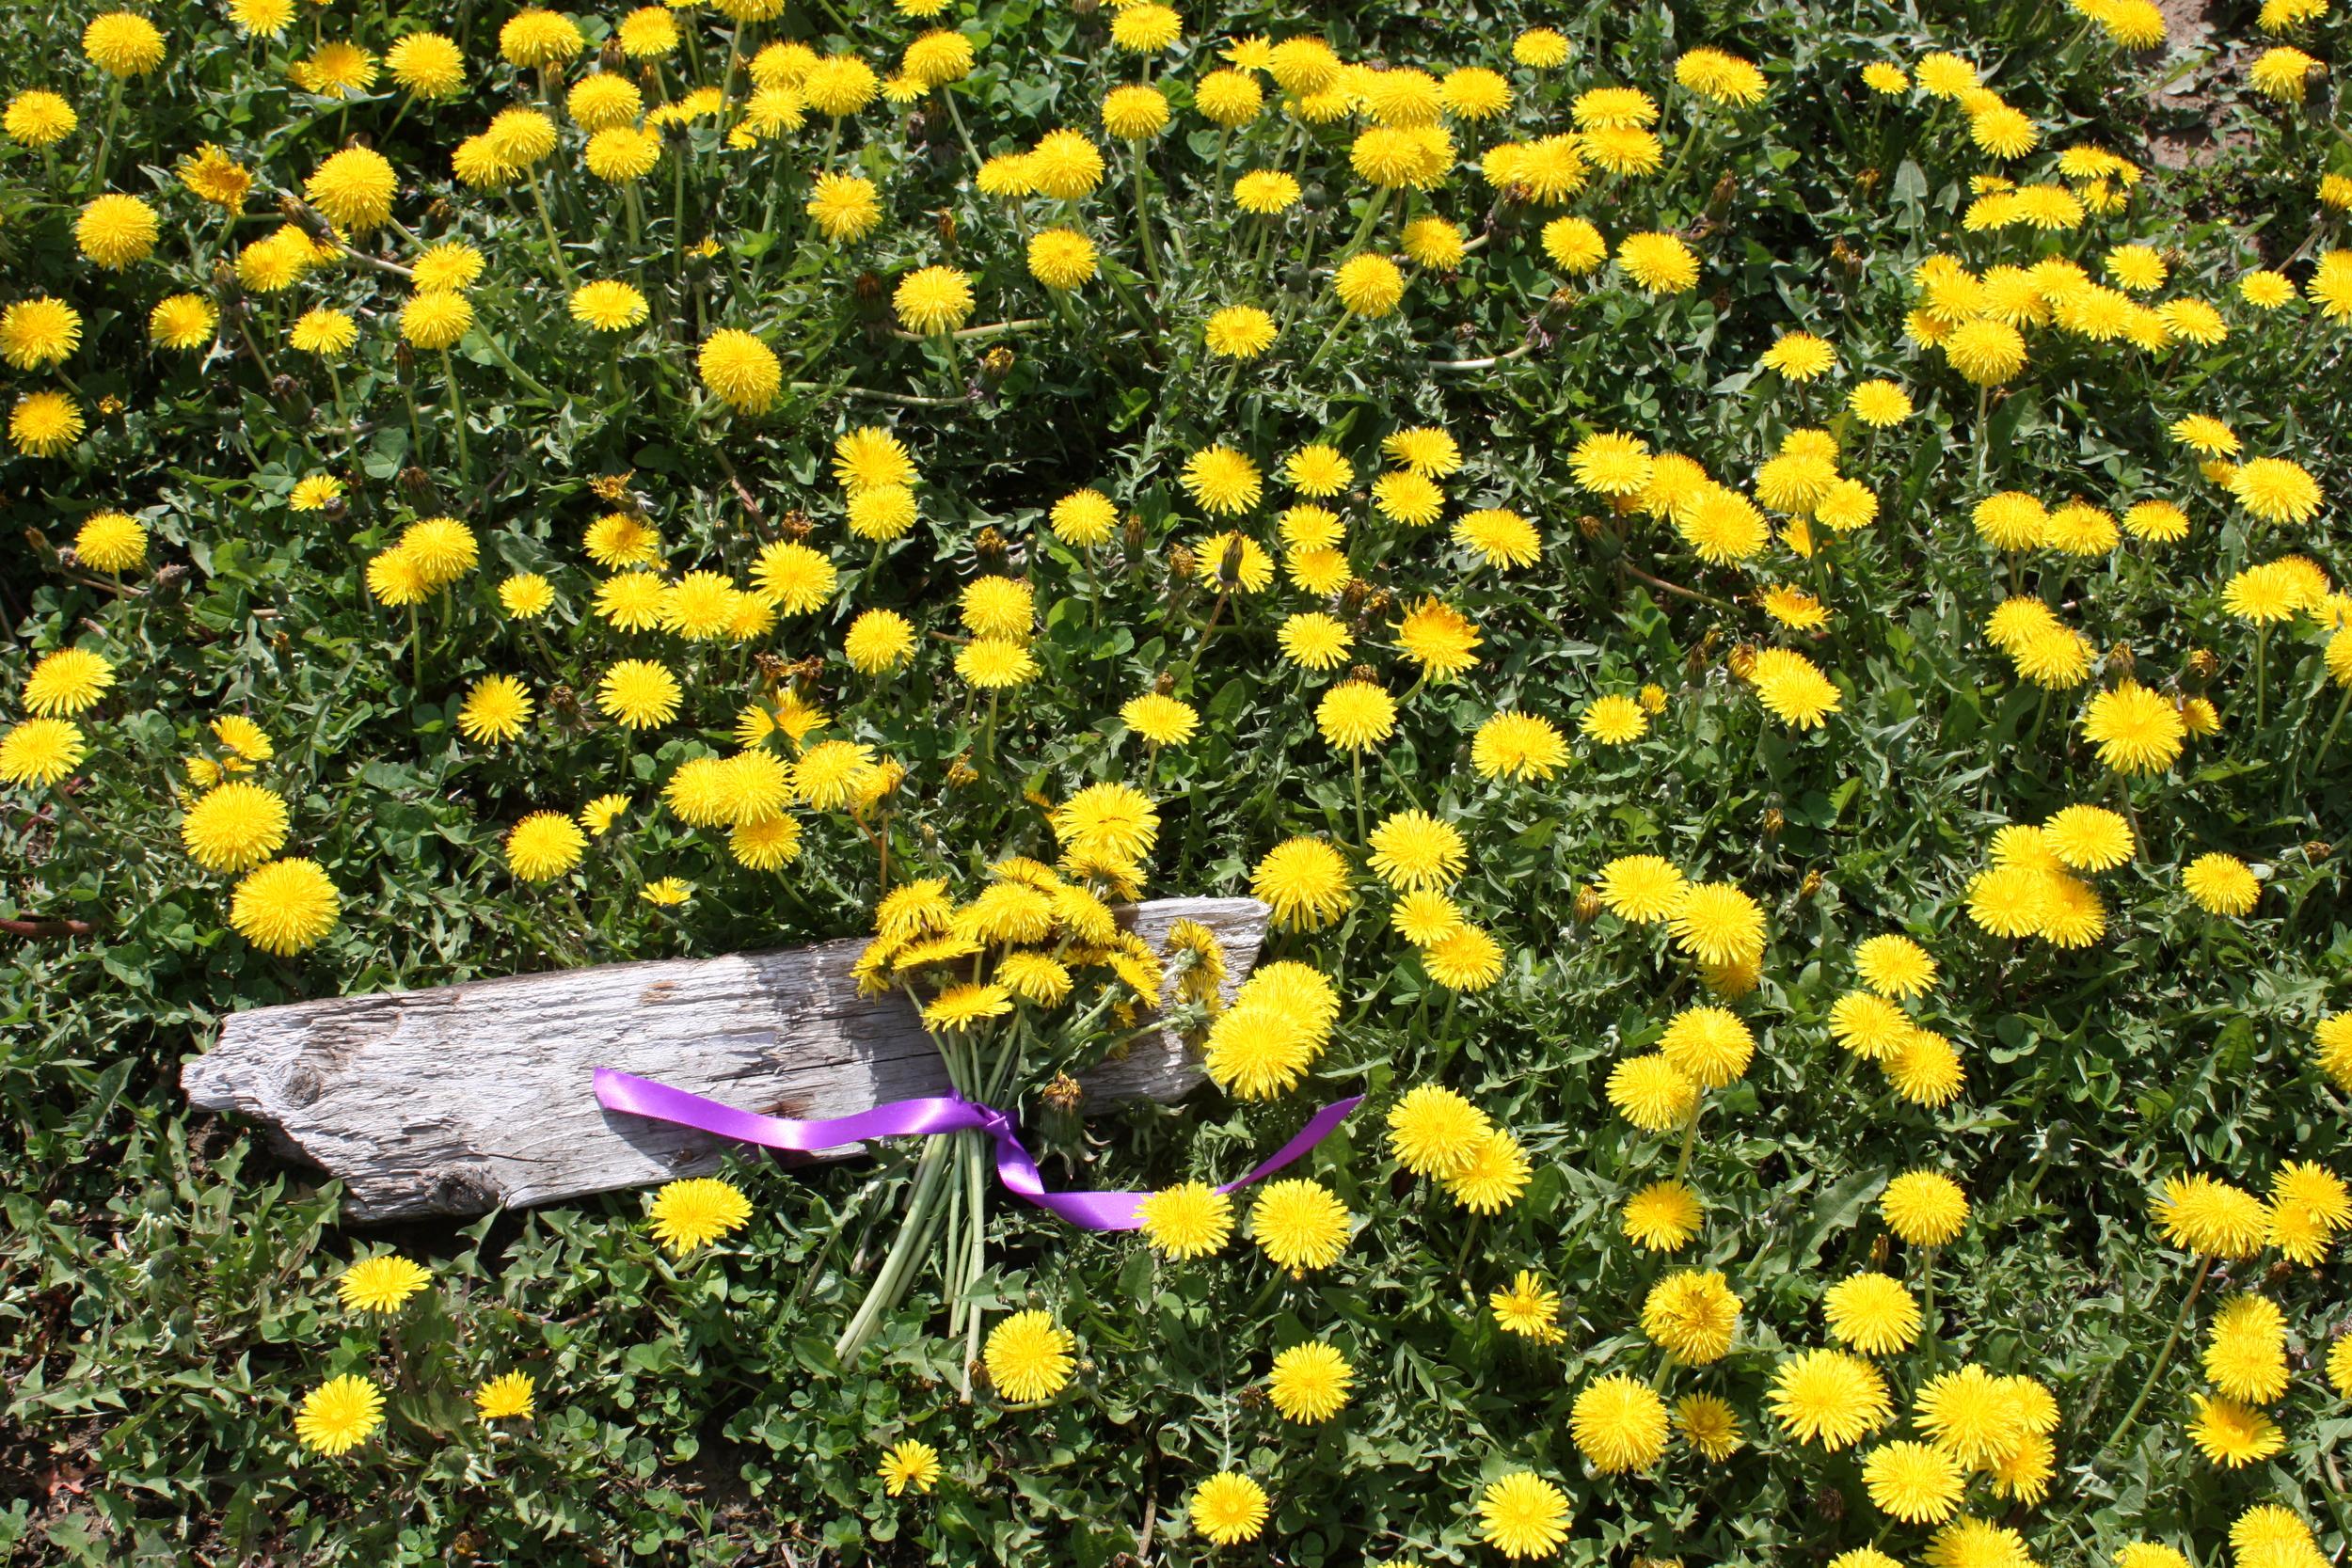 dandelions 2.jpeg